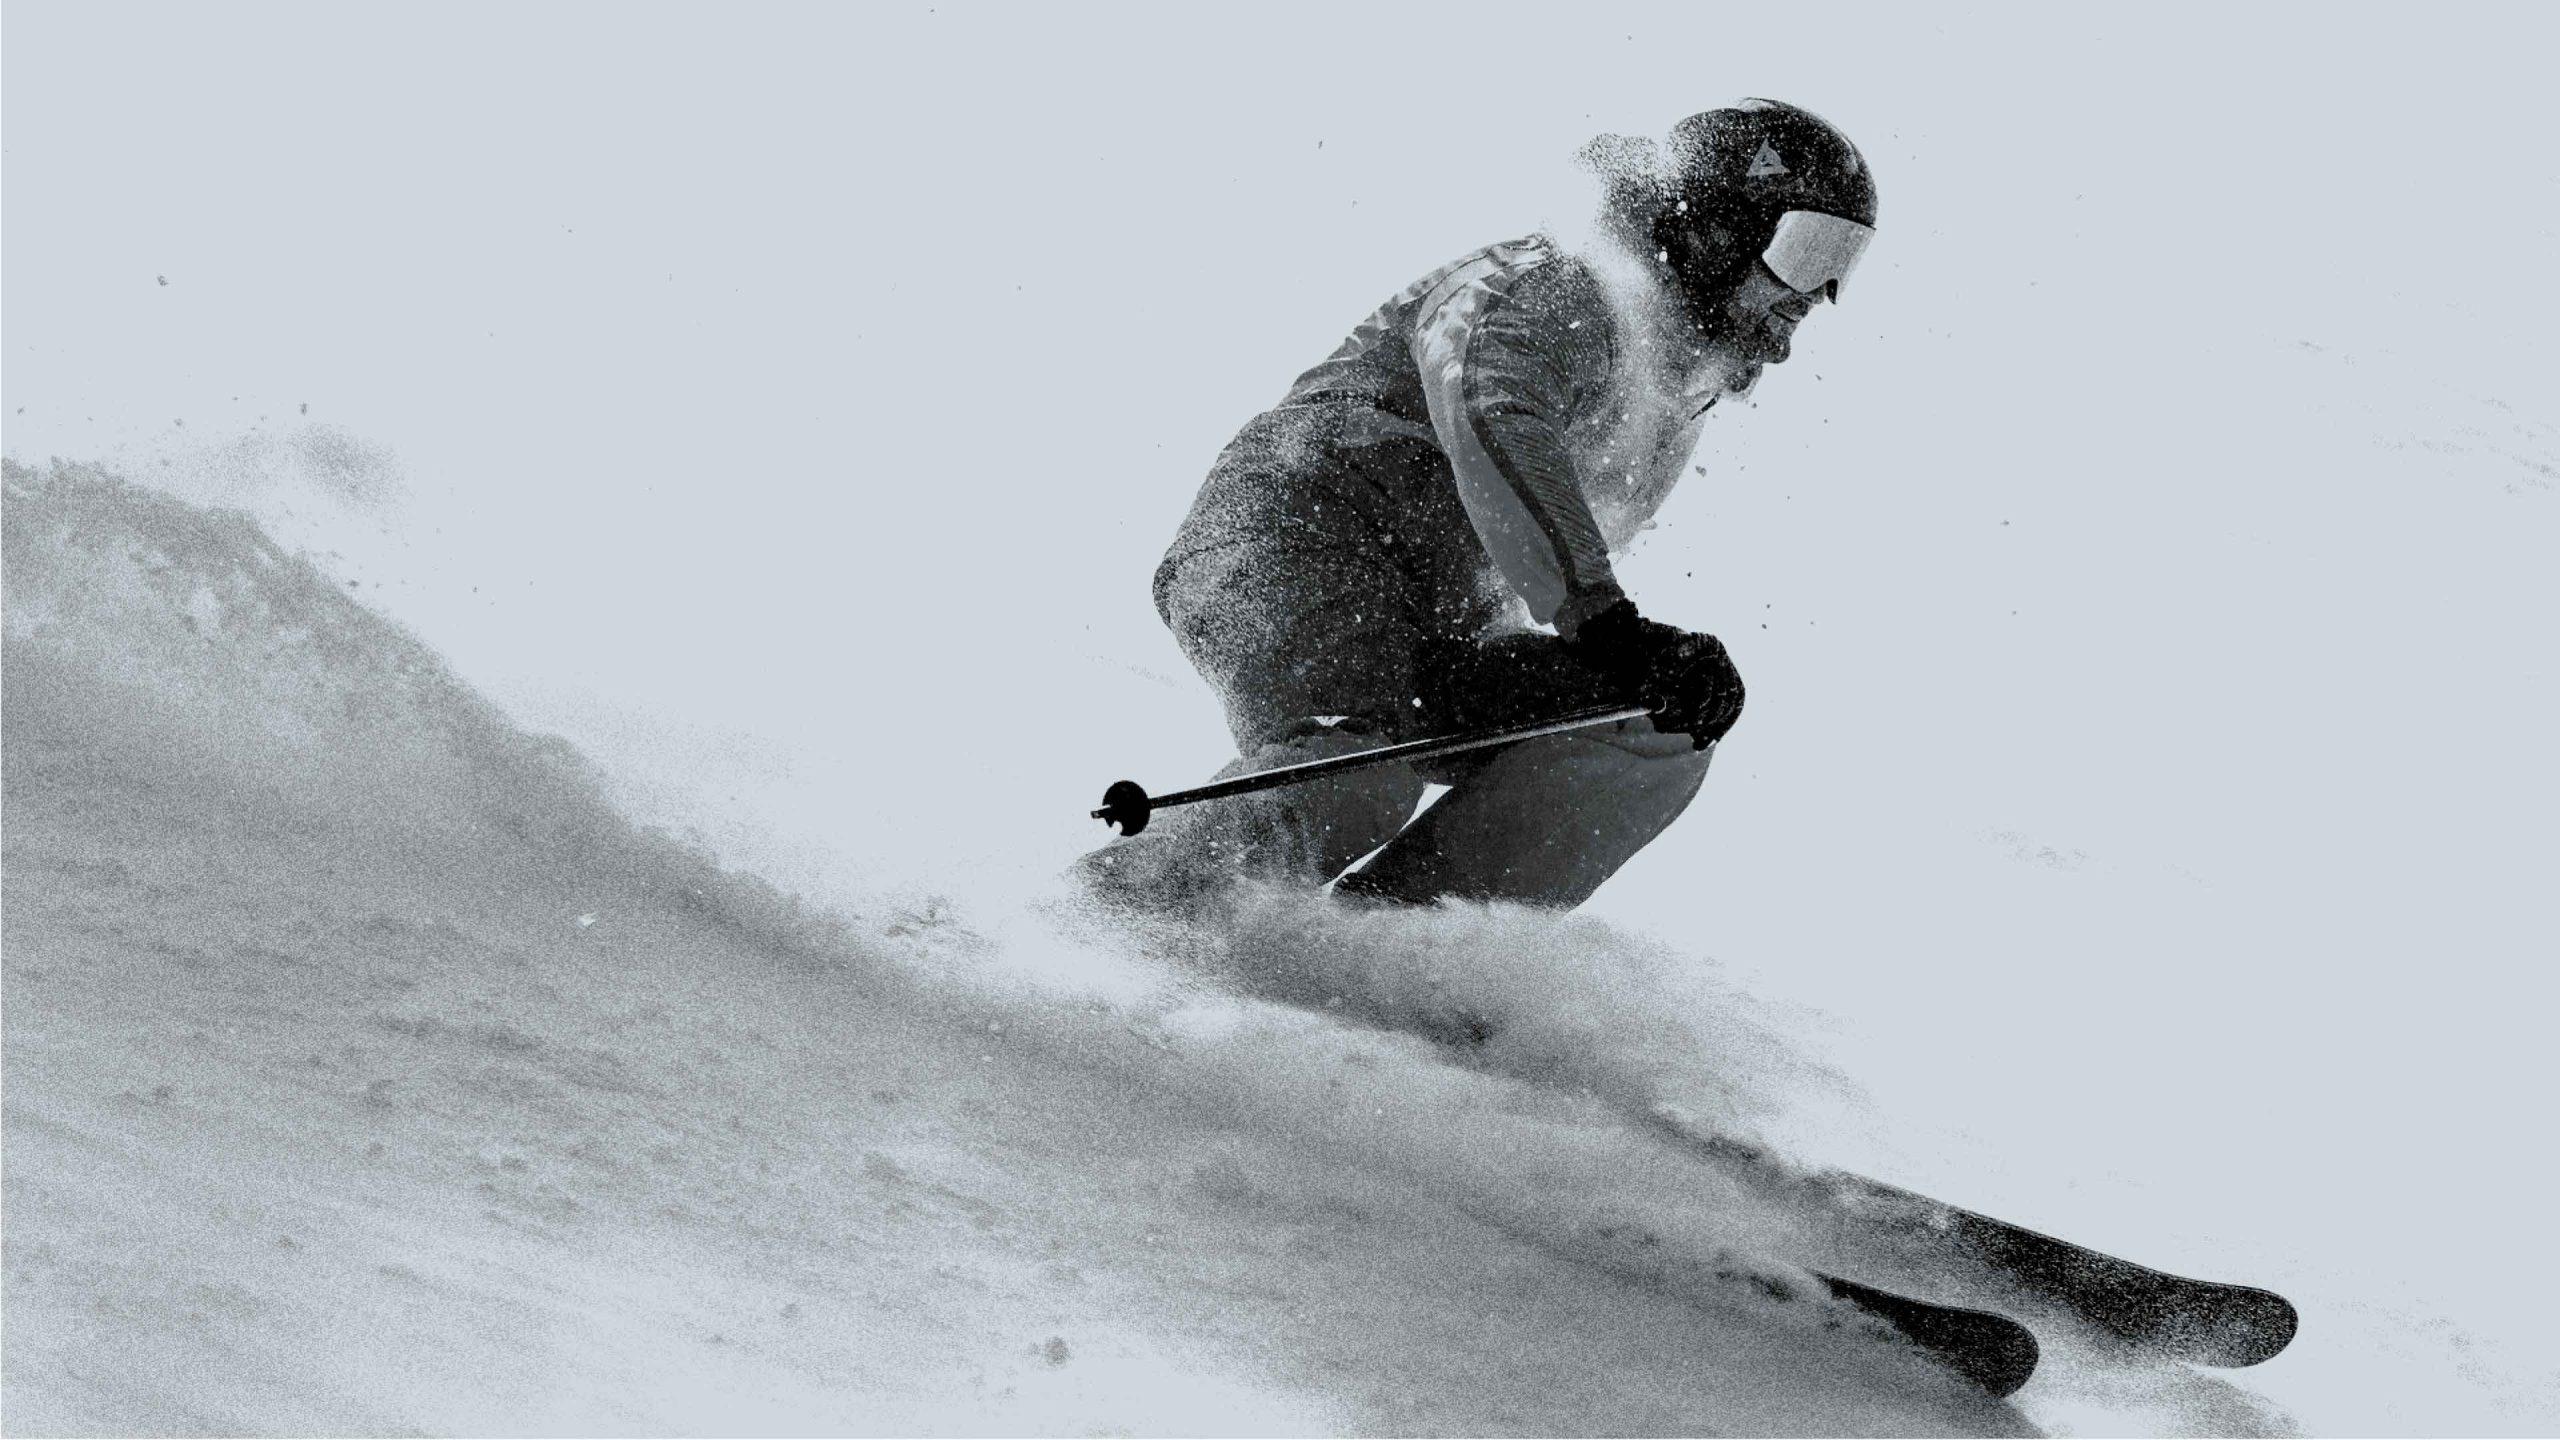 Dainese Winter Sports Photo Style